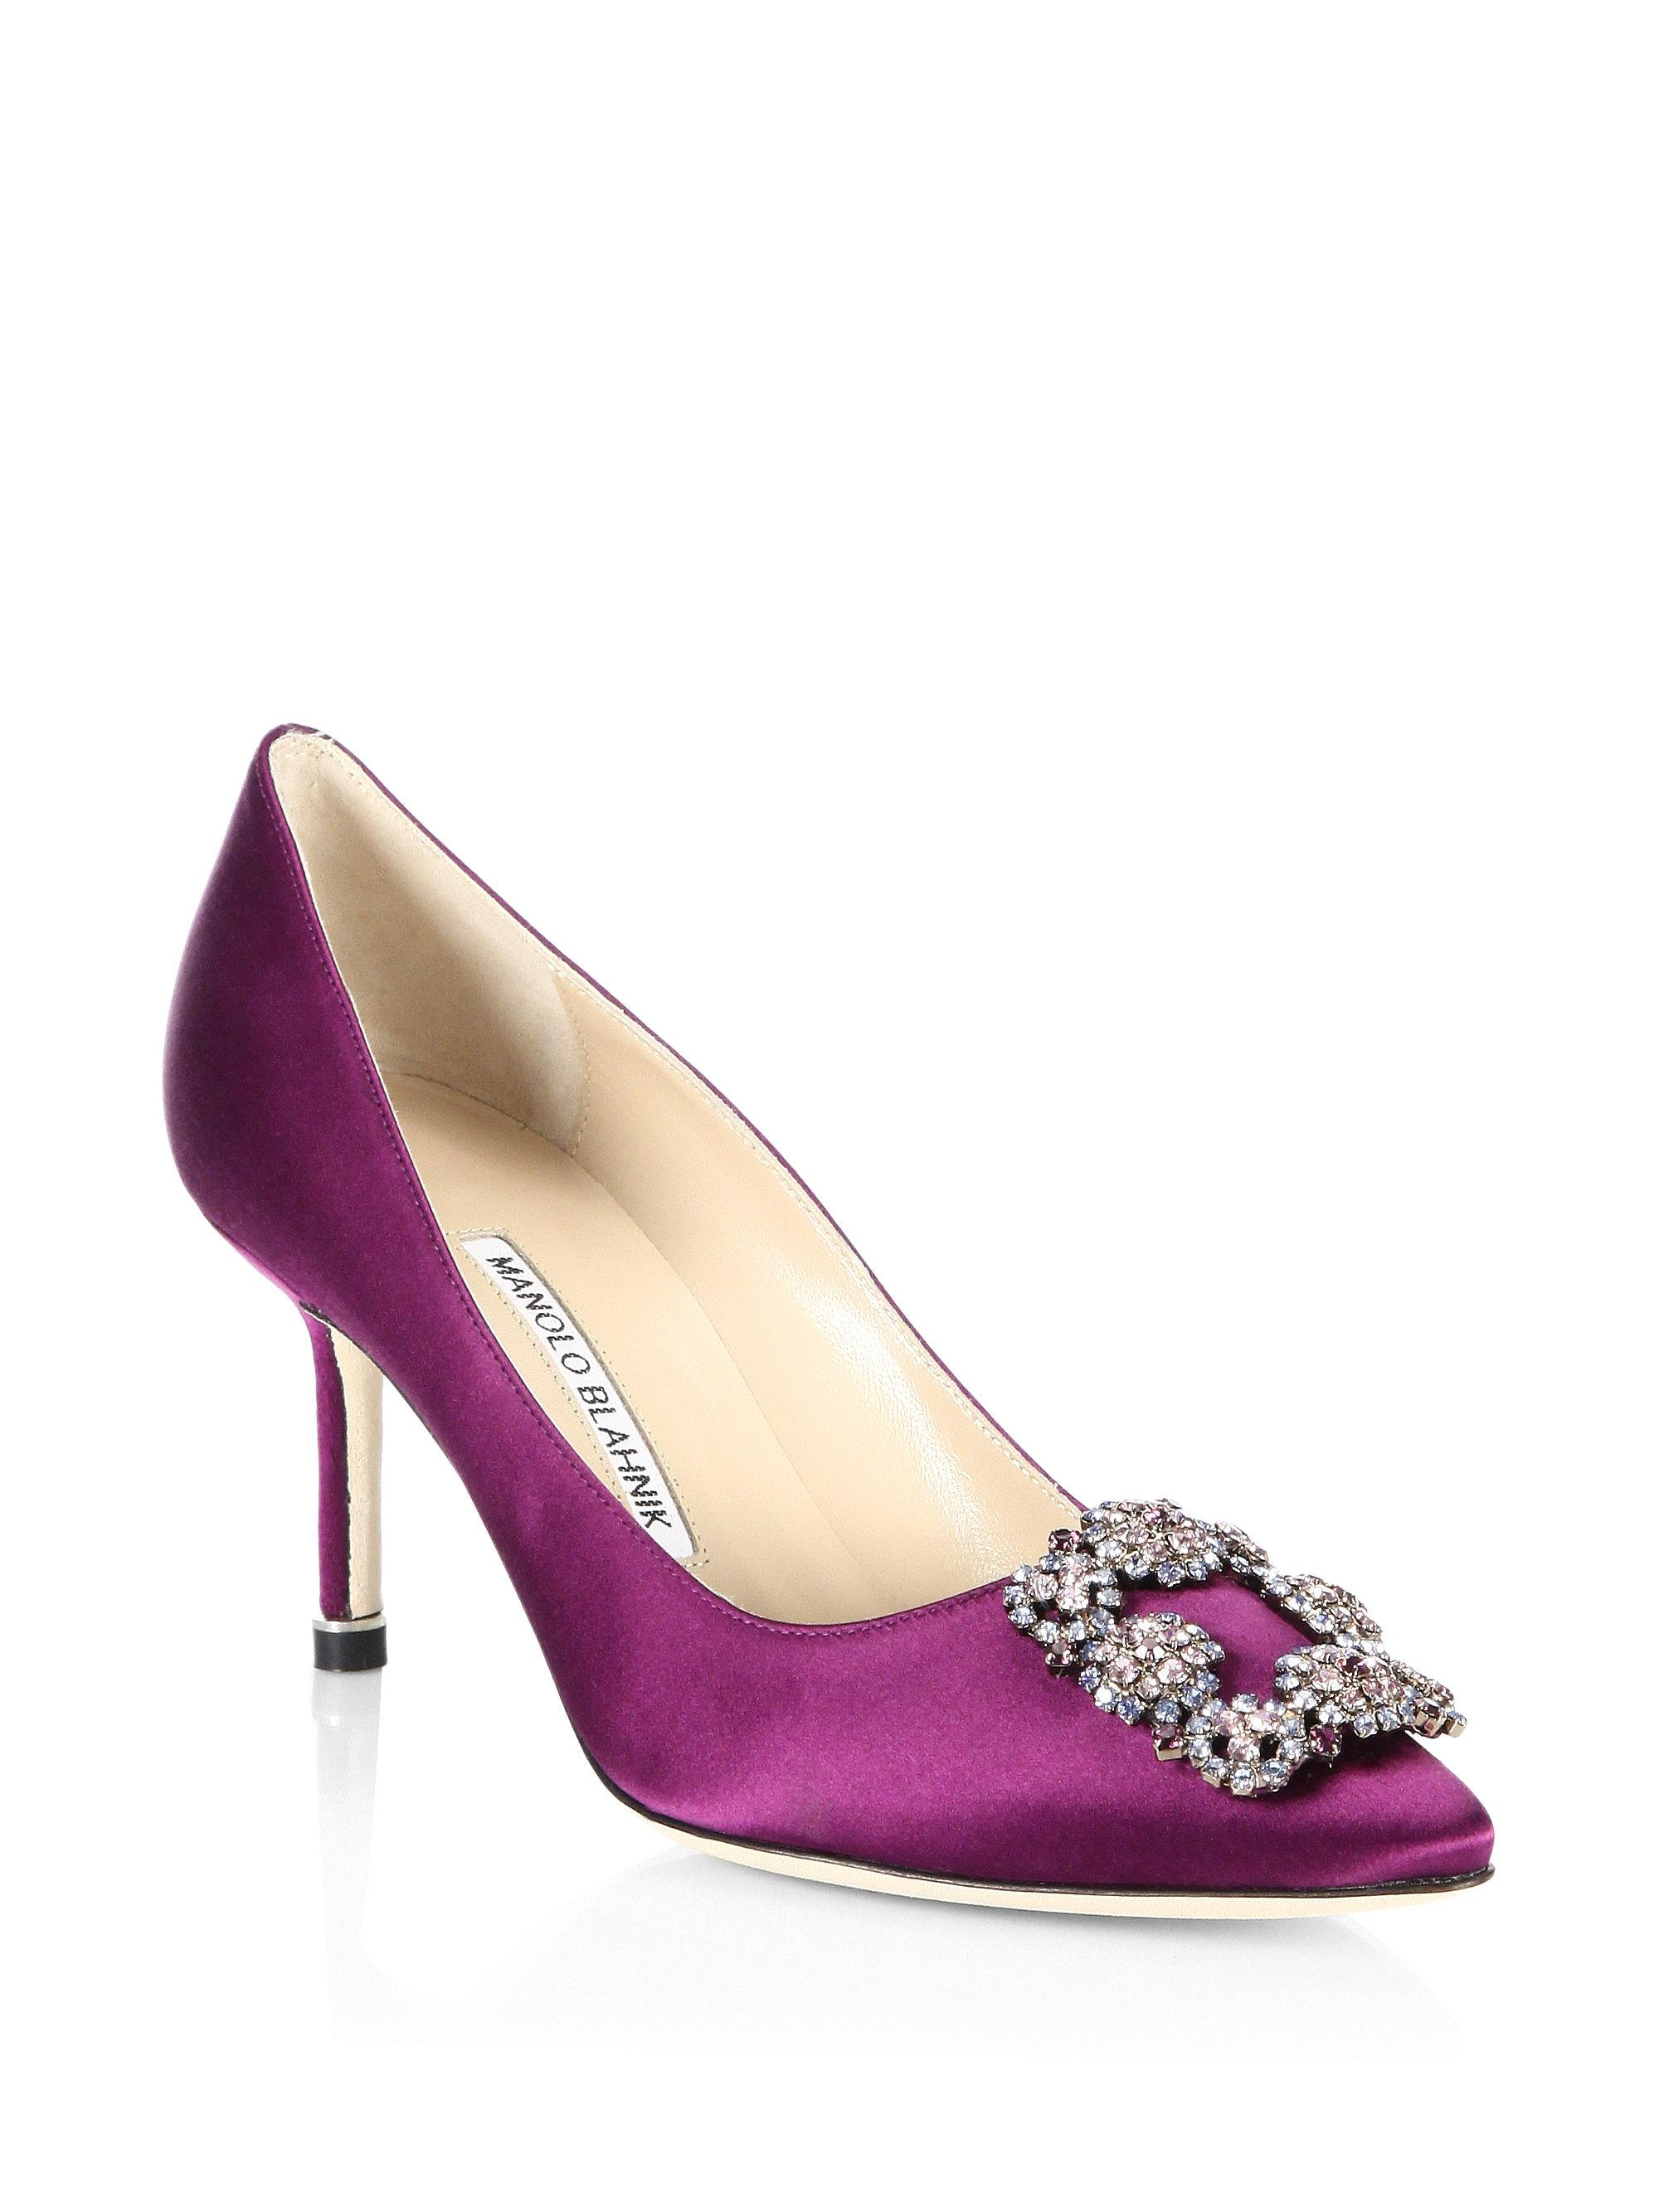 da04a4ce7575 Manolo Blahnik Hangisi 70 Ornamented Pumps in Purple - Lyst